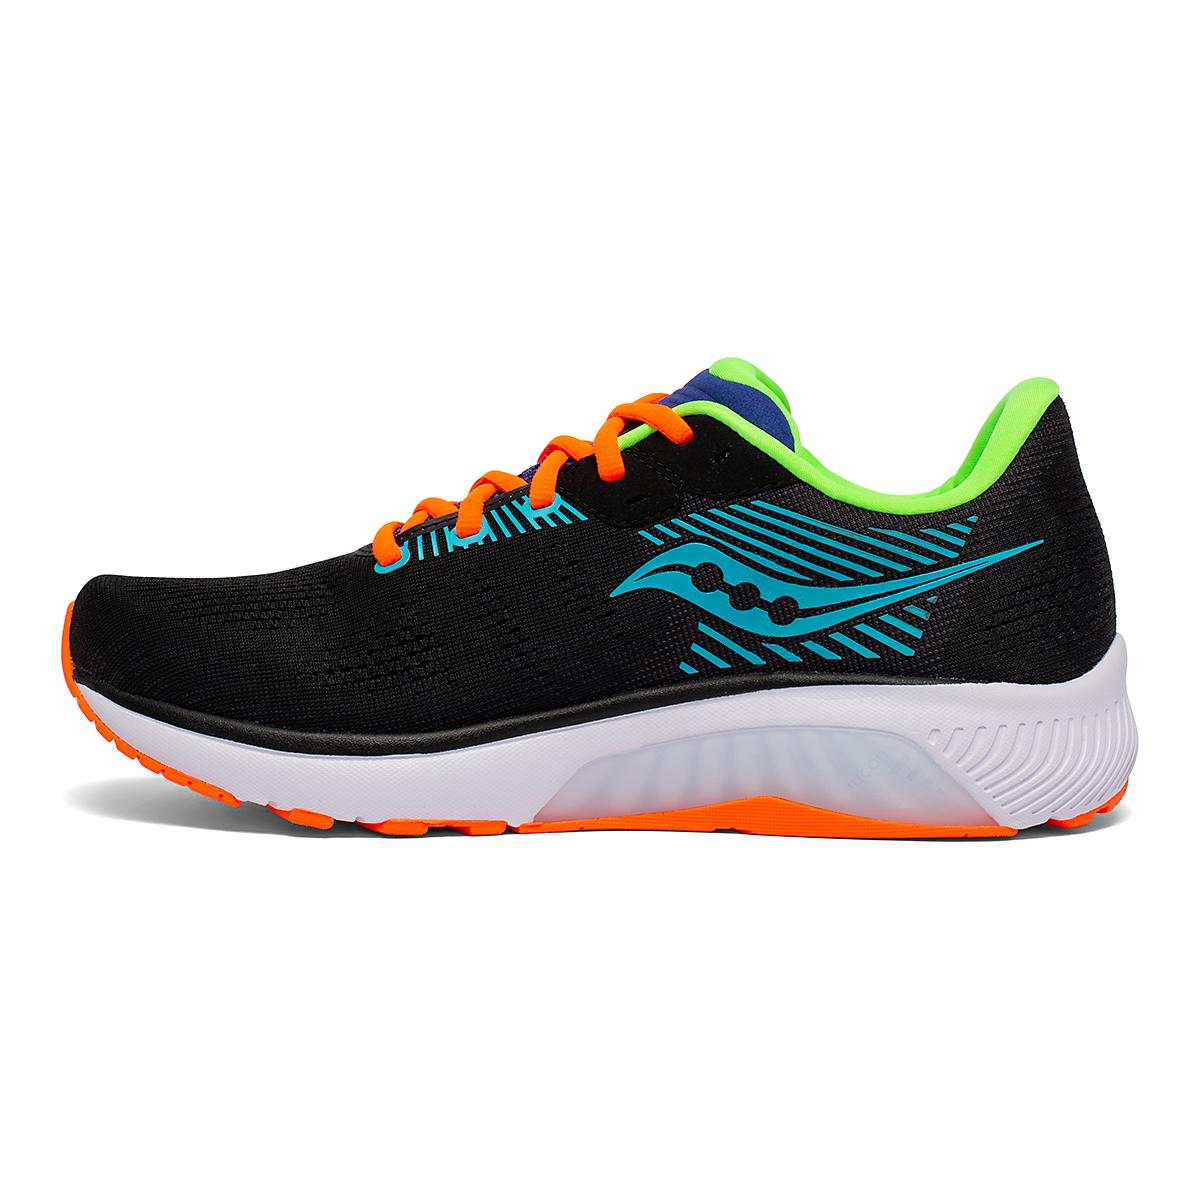 Men's Saucony Guide 14 Running Shoe - Color: Future/Black - Size: 7 - Width: Regular, Future/Black, large, image 2